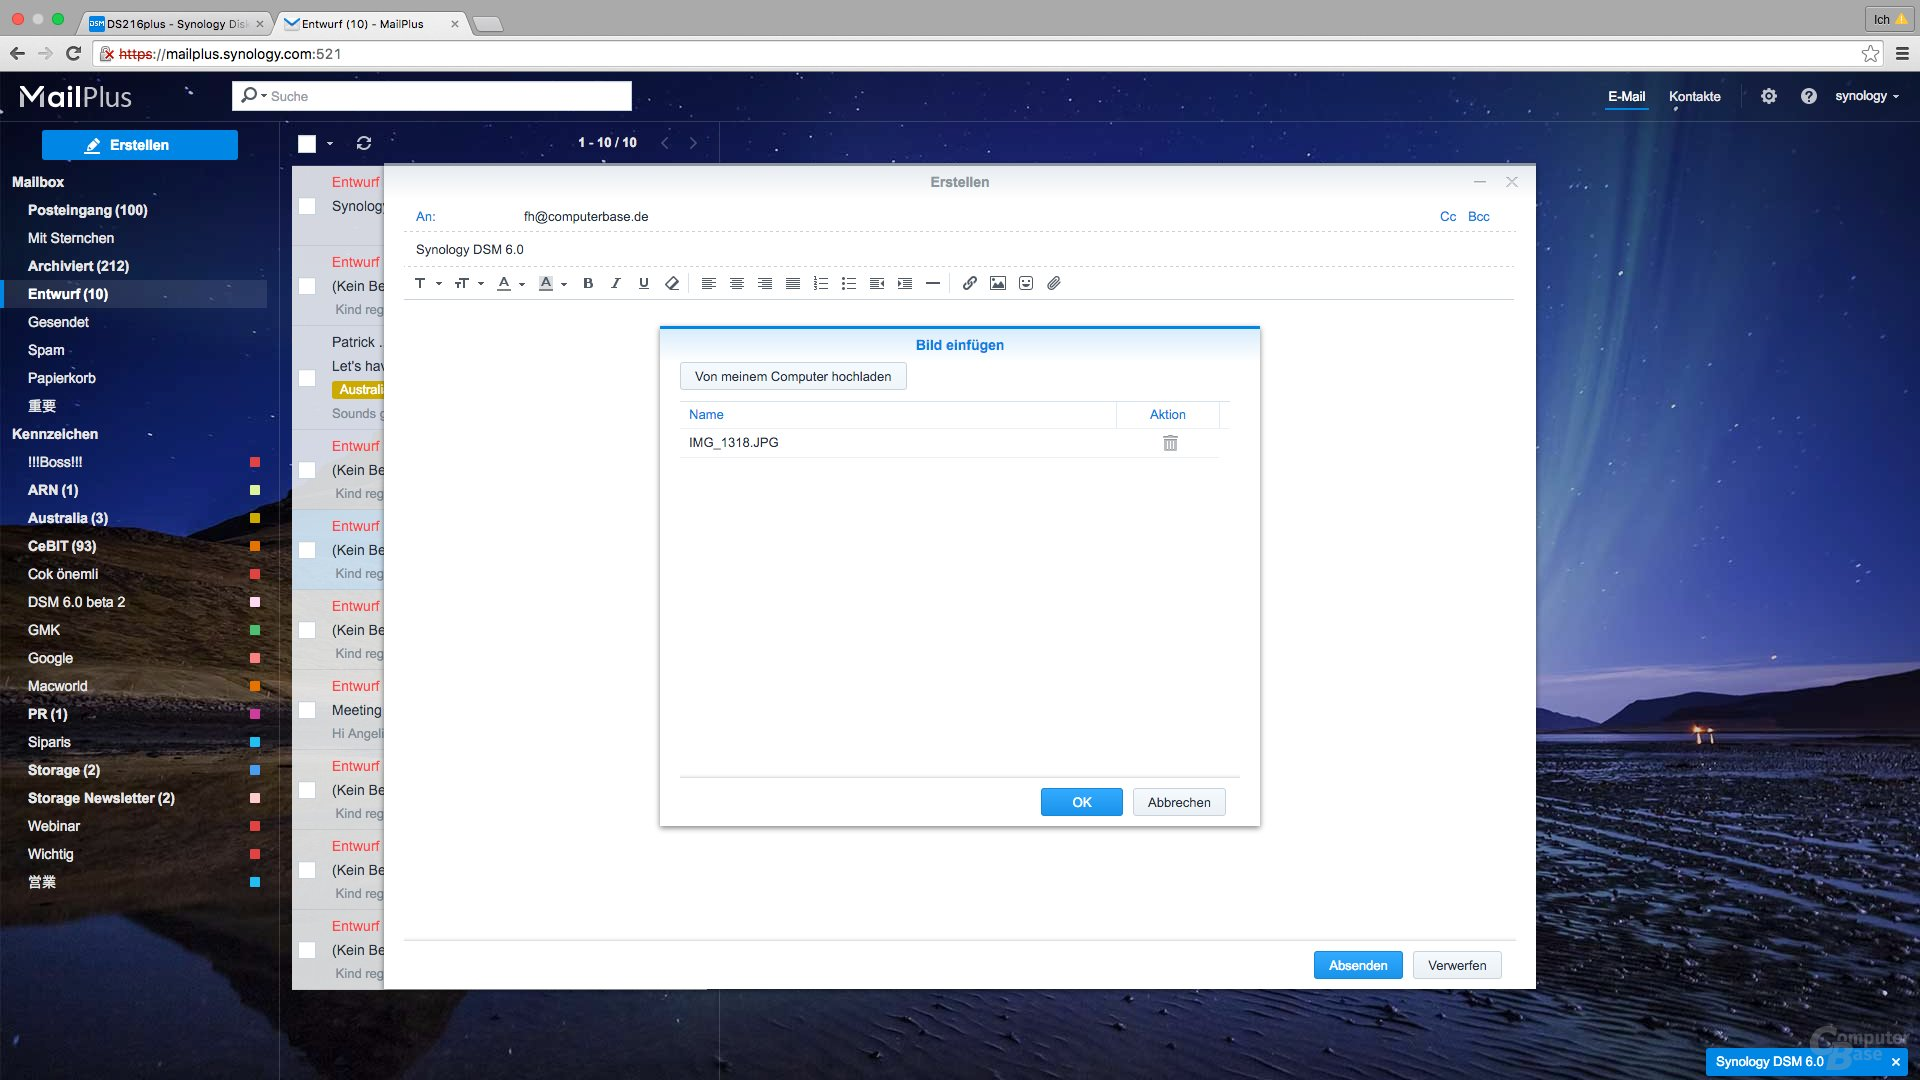 Synology DSM 6.0: MailPlus